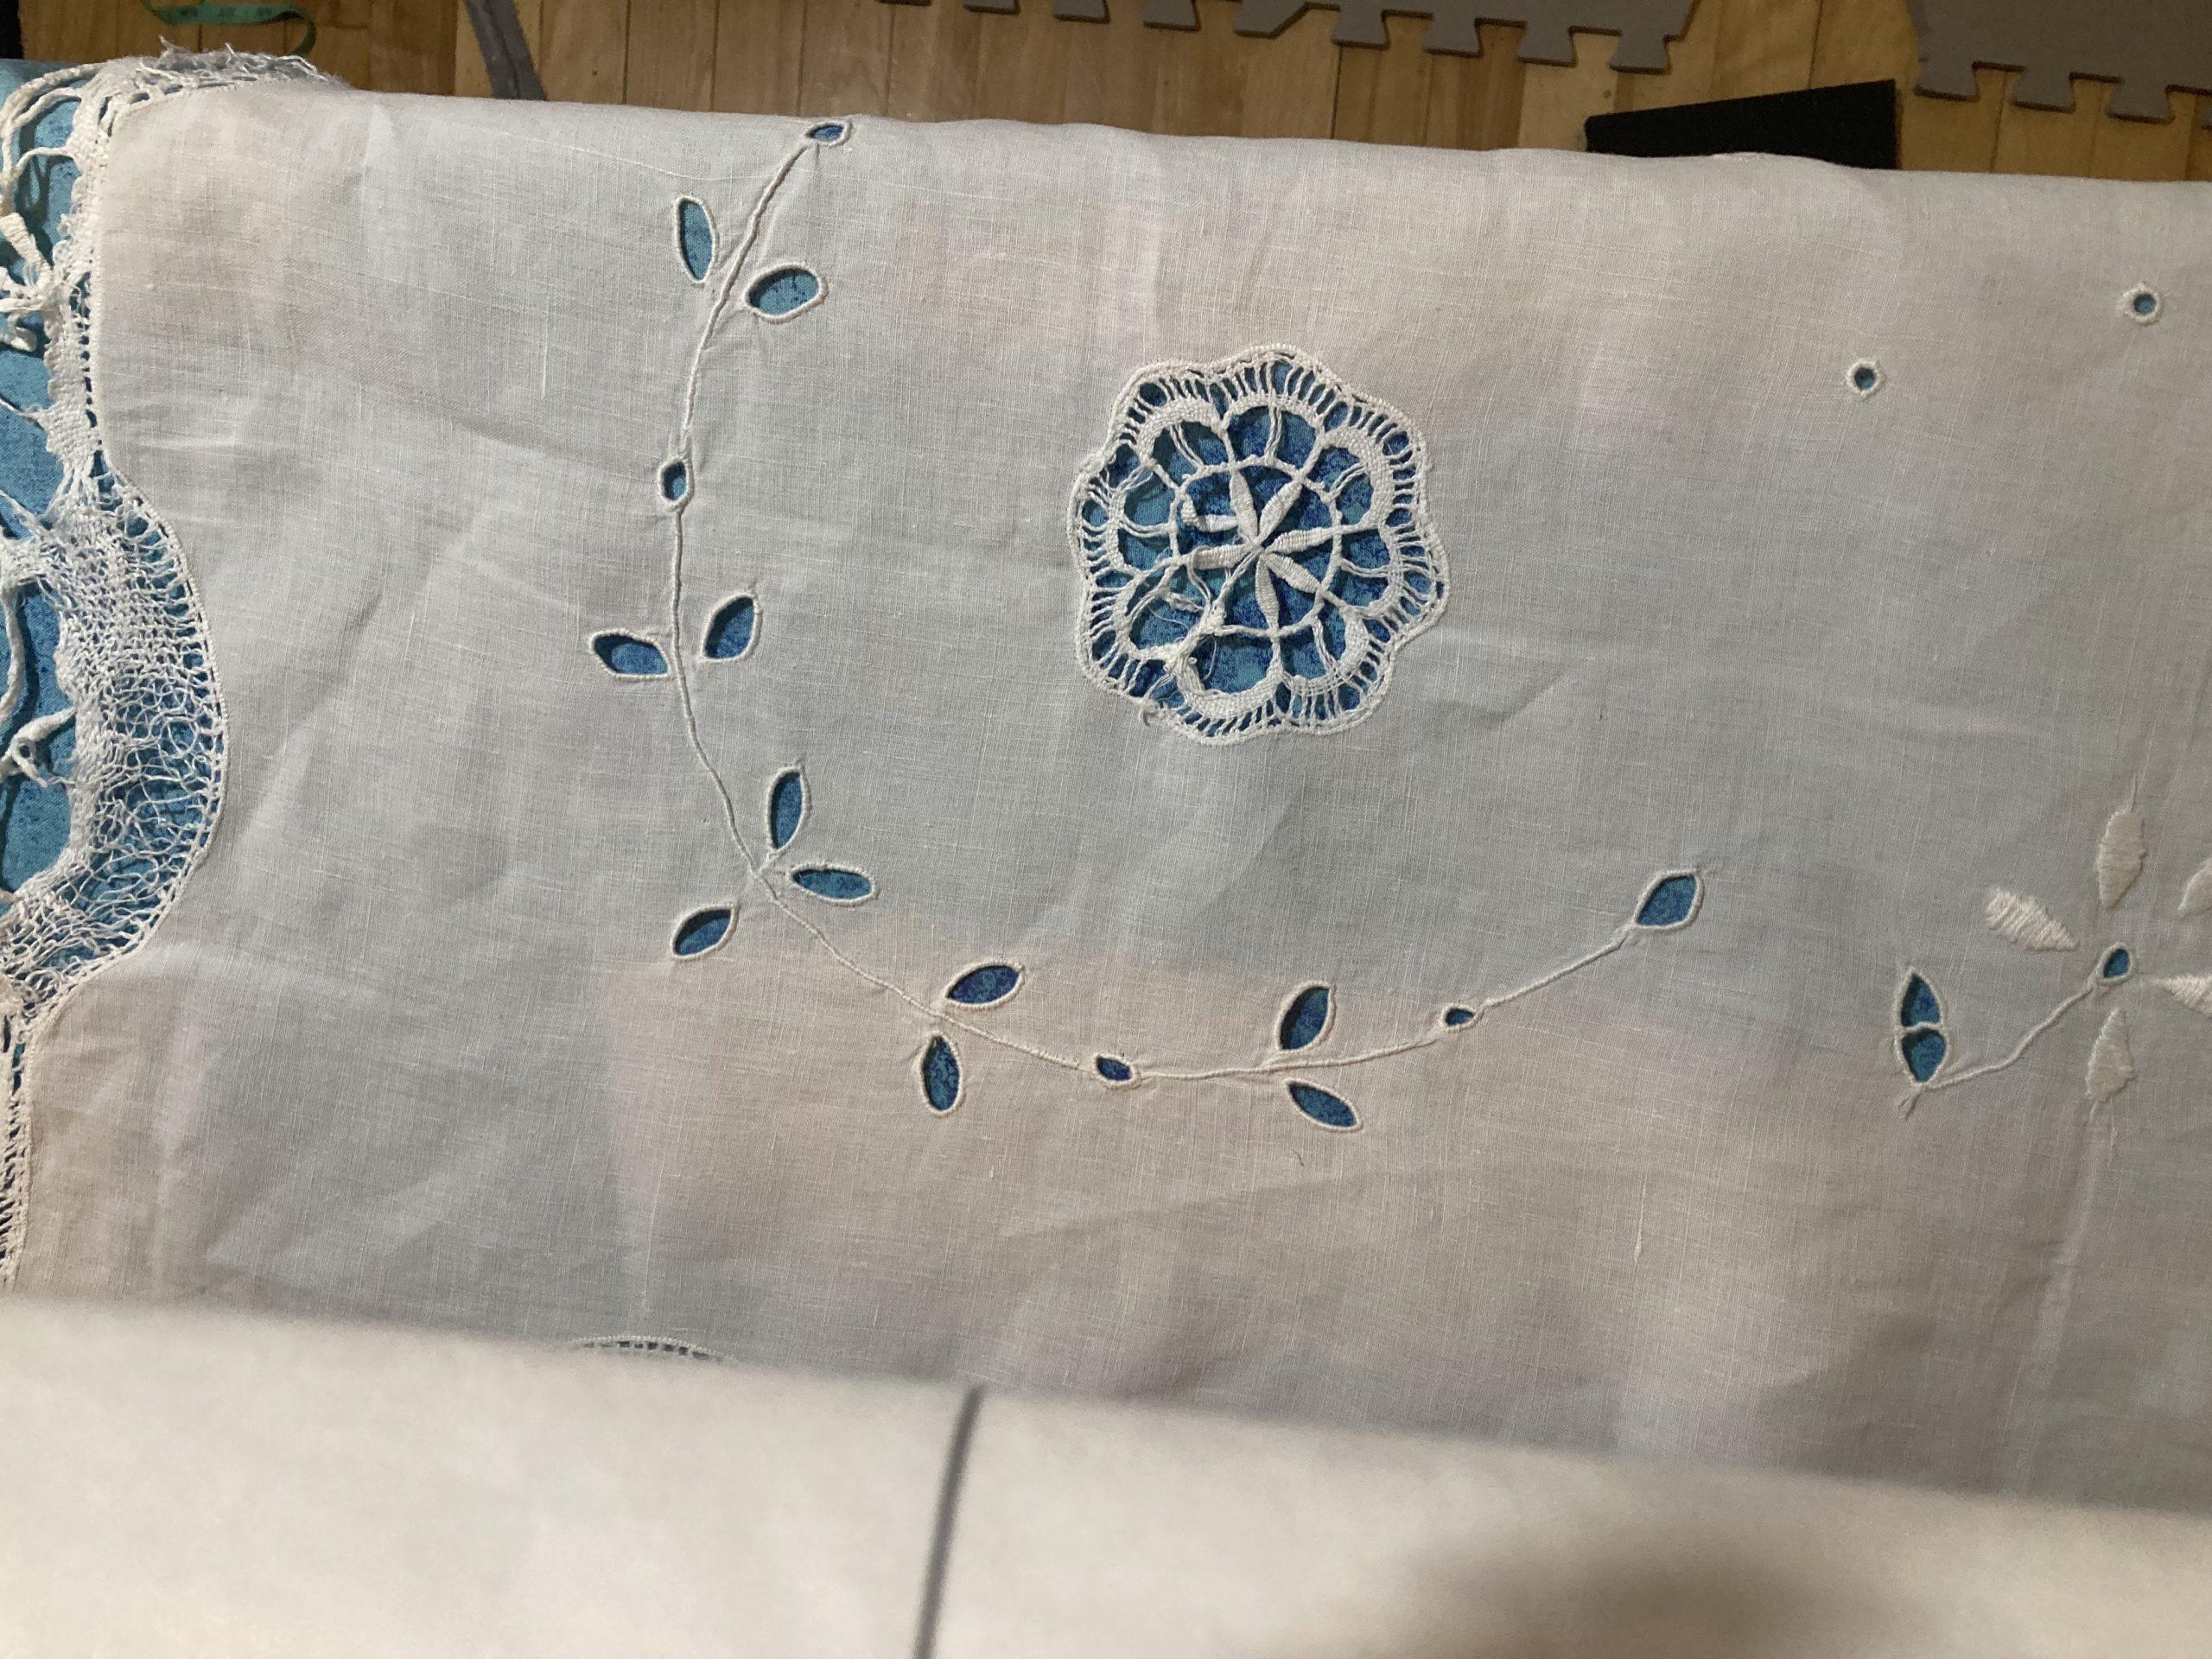 Repurposing an Antique Tablecloth into a Quilt, p.1